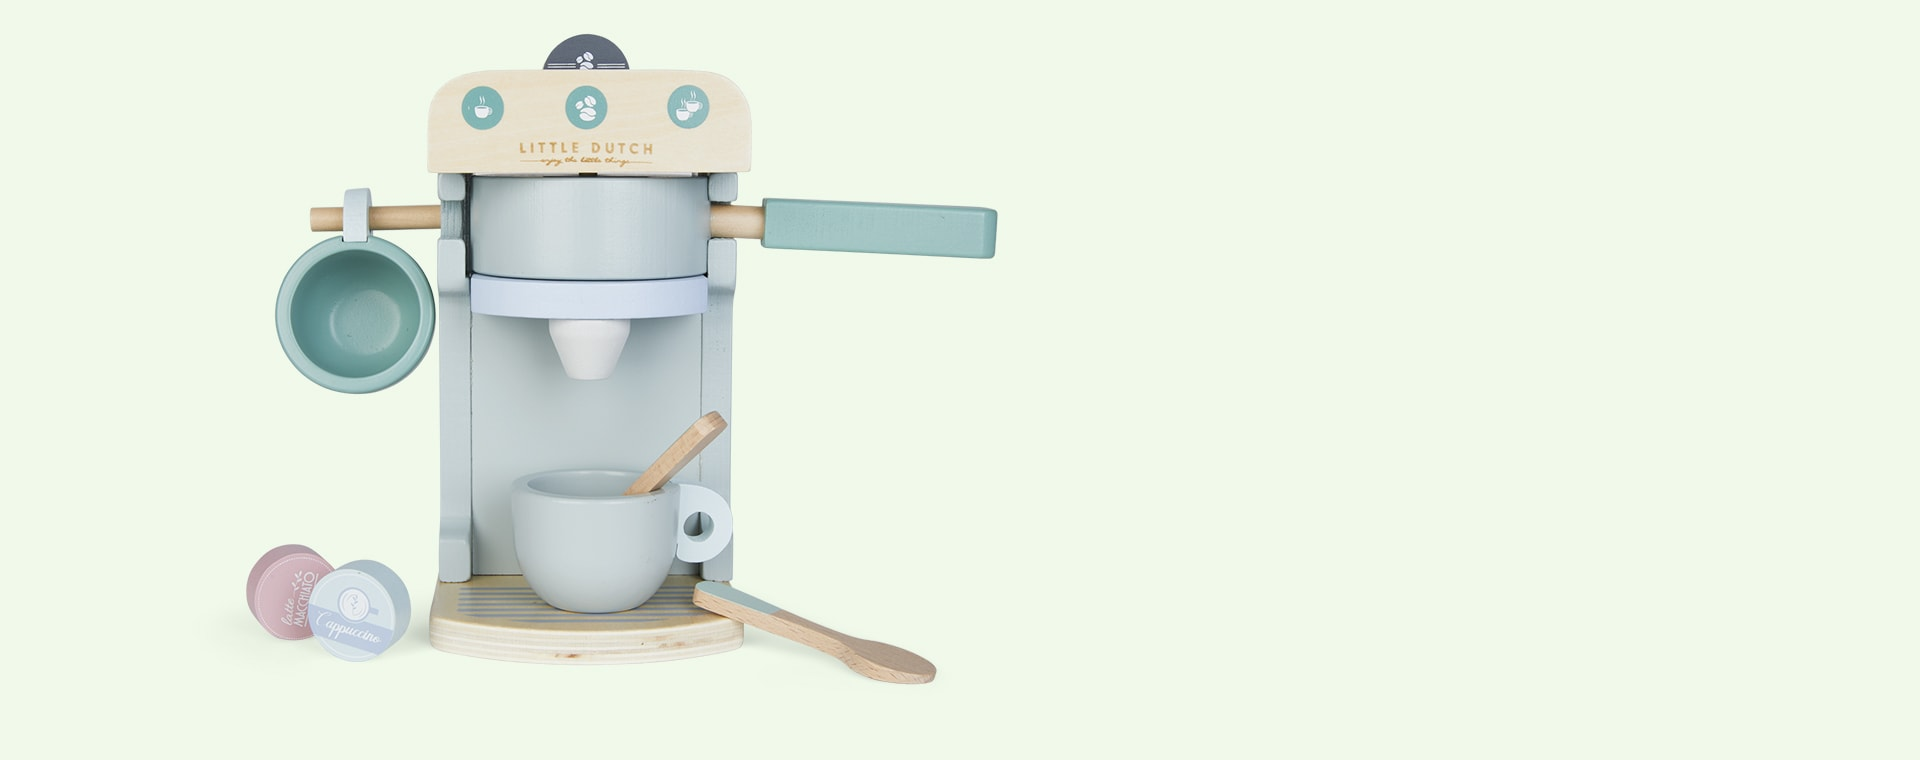 Mint Little Dutch Coffee Machine